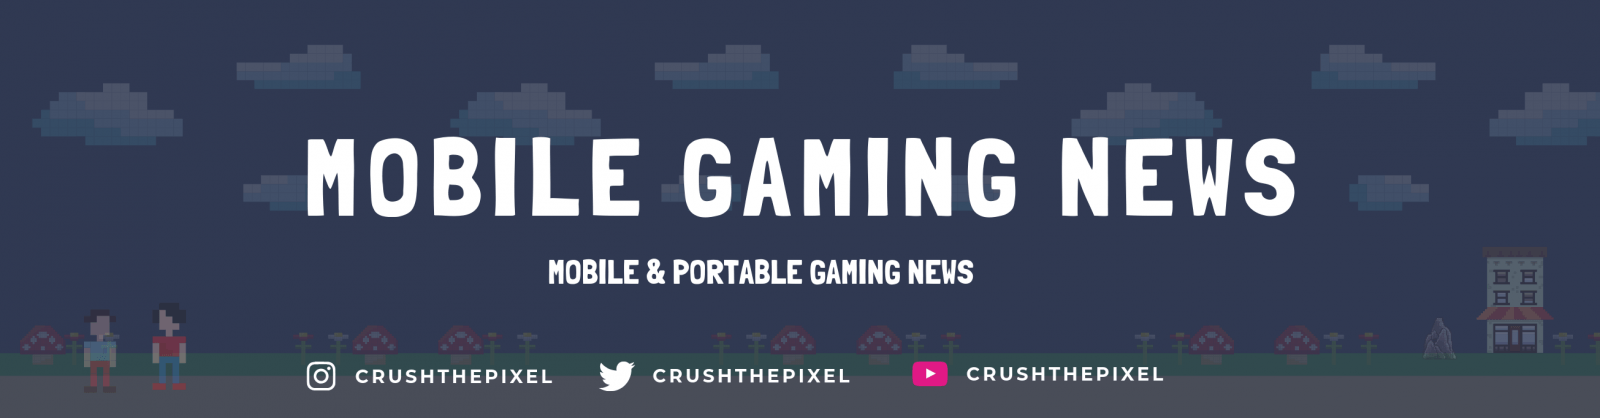 Mobile Gaming Reviews News